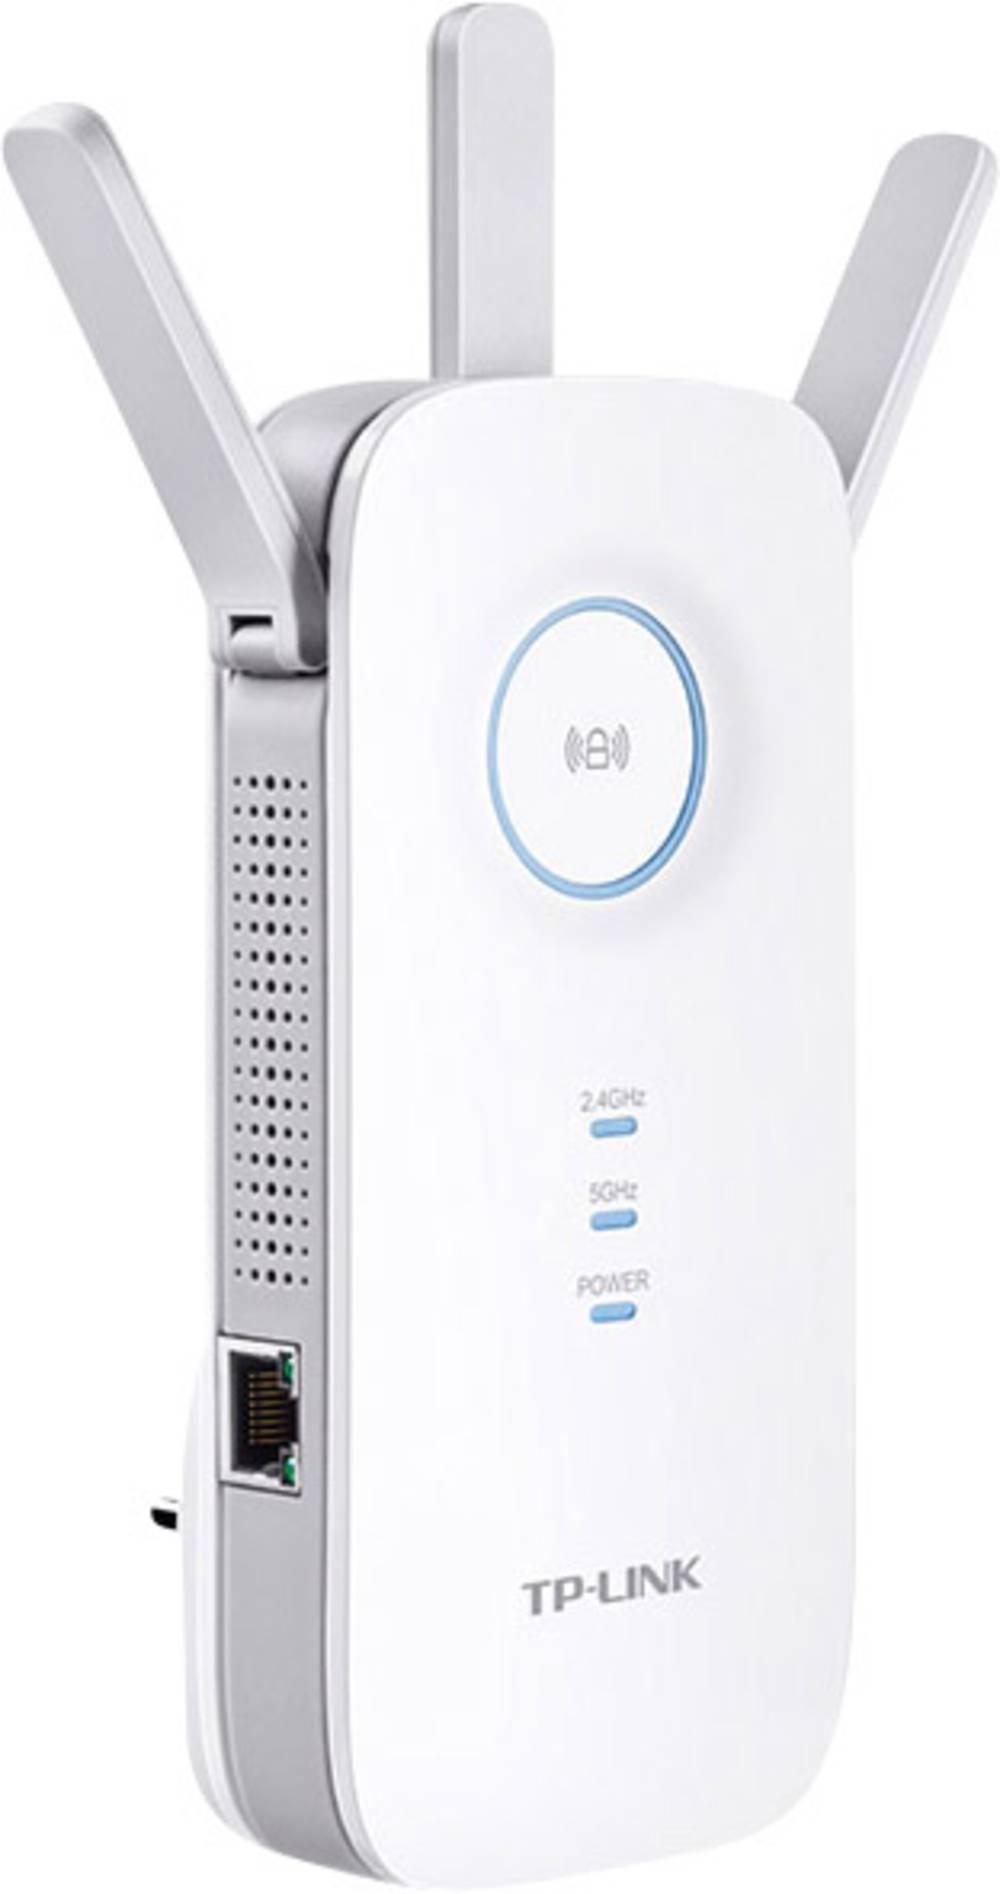 TP-LINK RE450 WLAN ojačevalnik 1.75 Gbit/s 2.4 GHz, 5 GHz